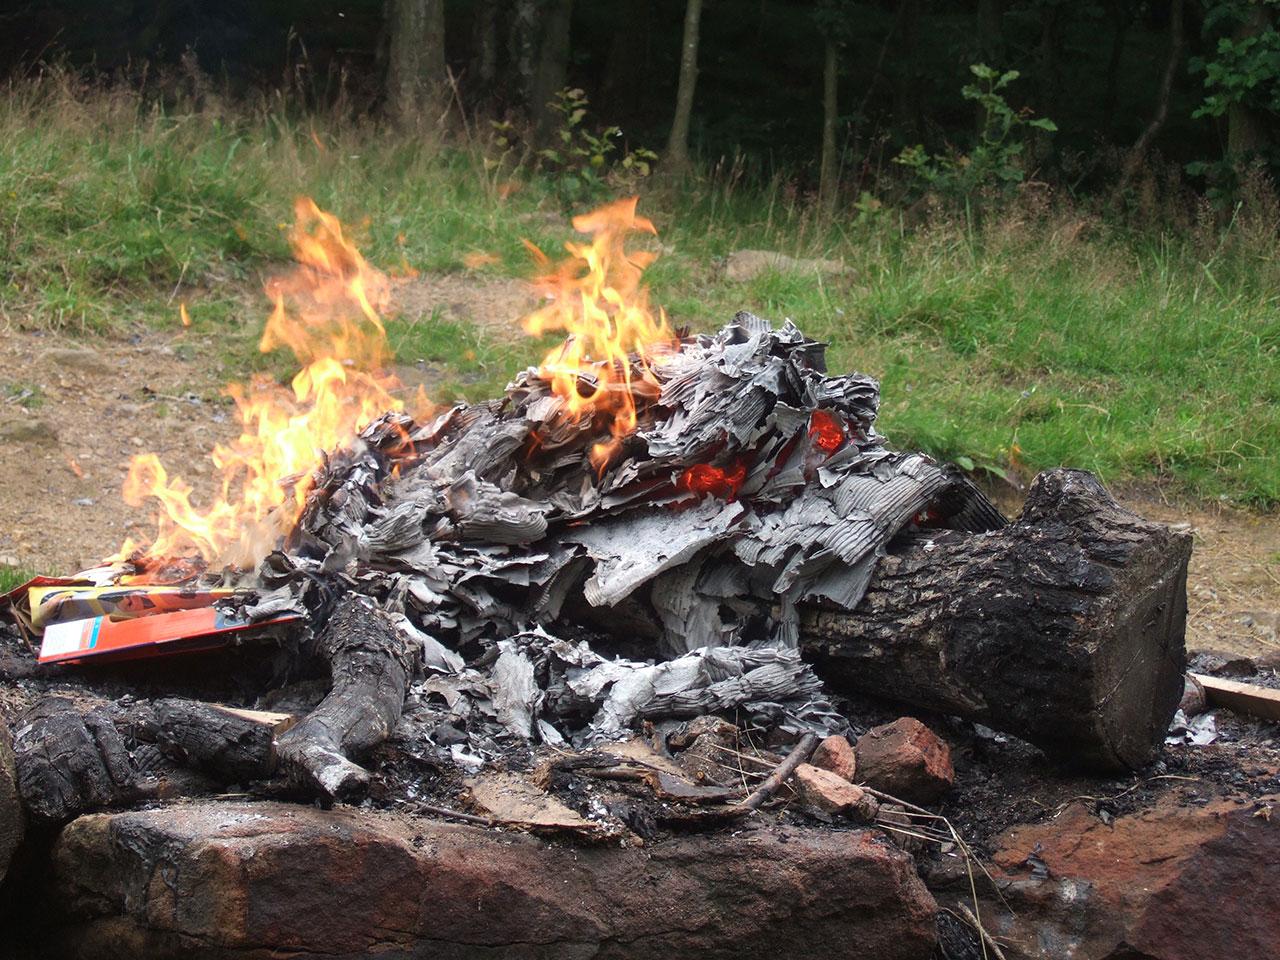 What cardboard looks like when it burns (photo via flickr.com/bensutherland)